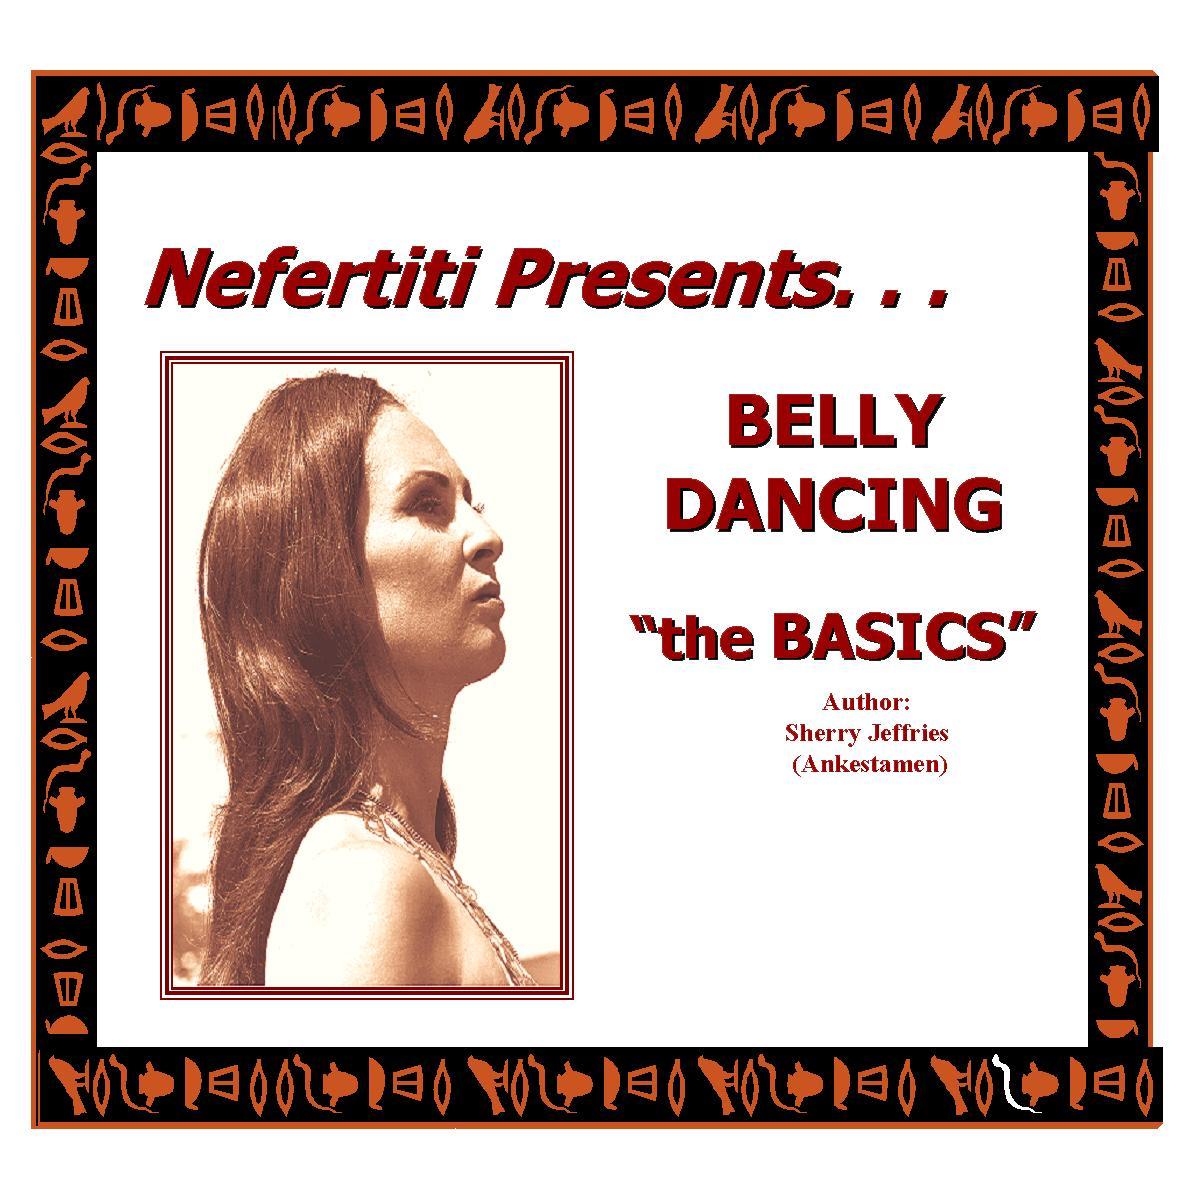 Nefertiti Presents Belly Dancing the Basics EB9780976803409